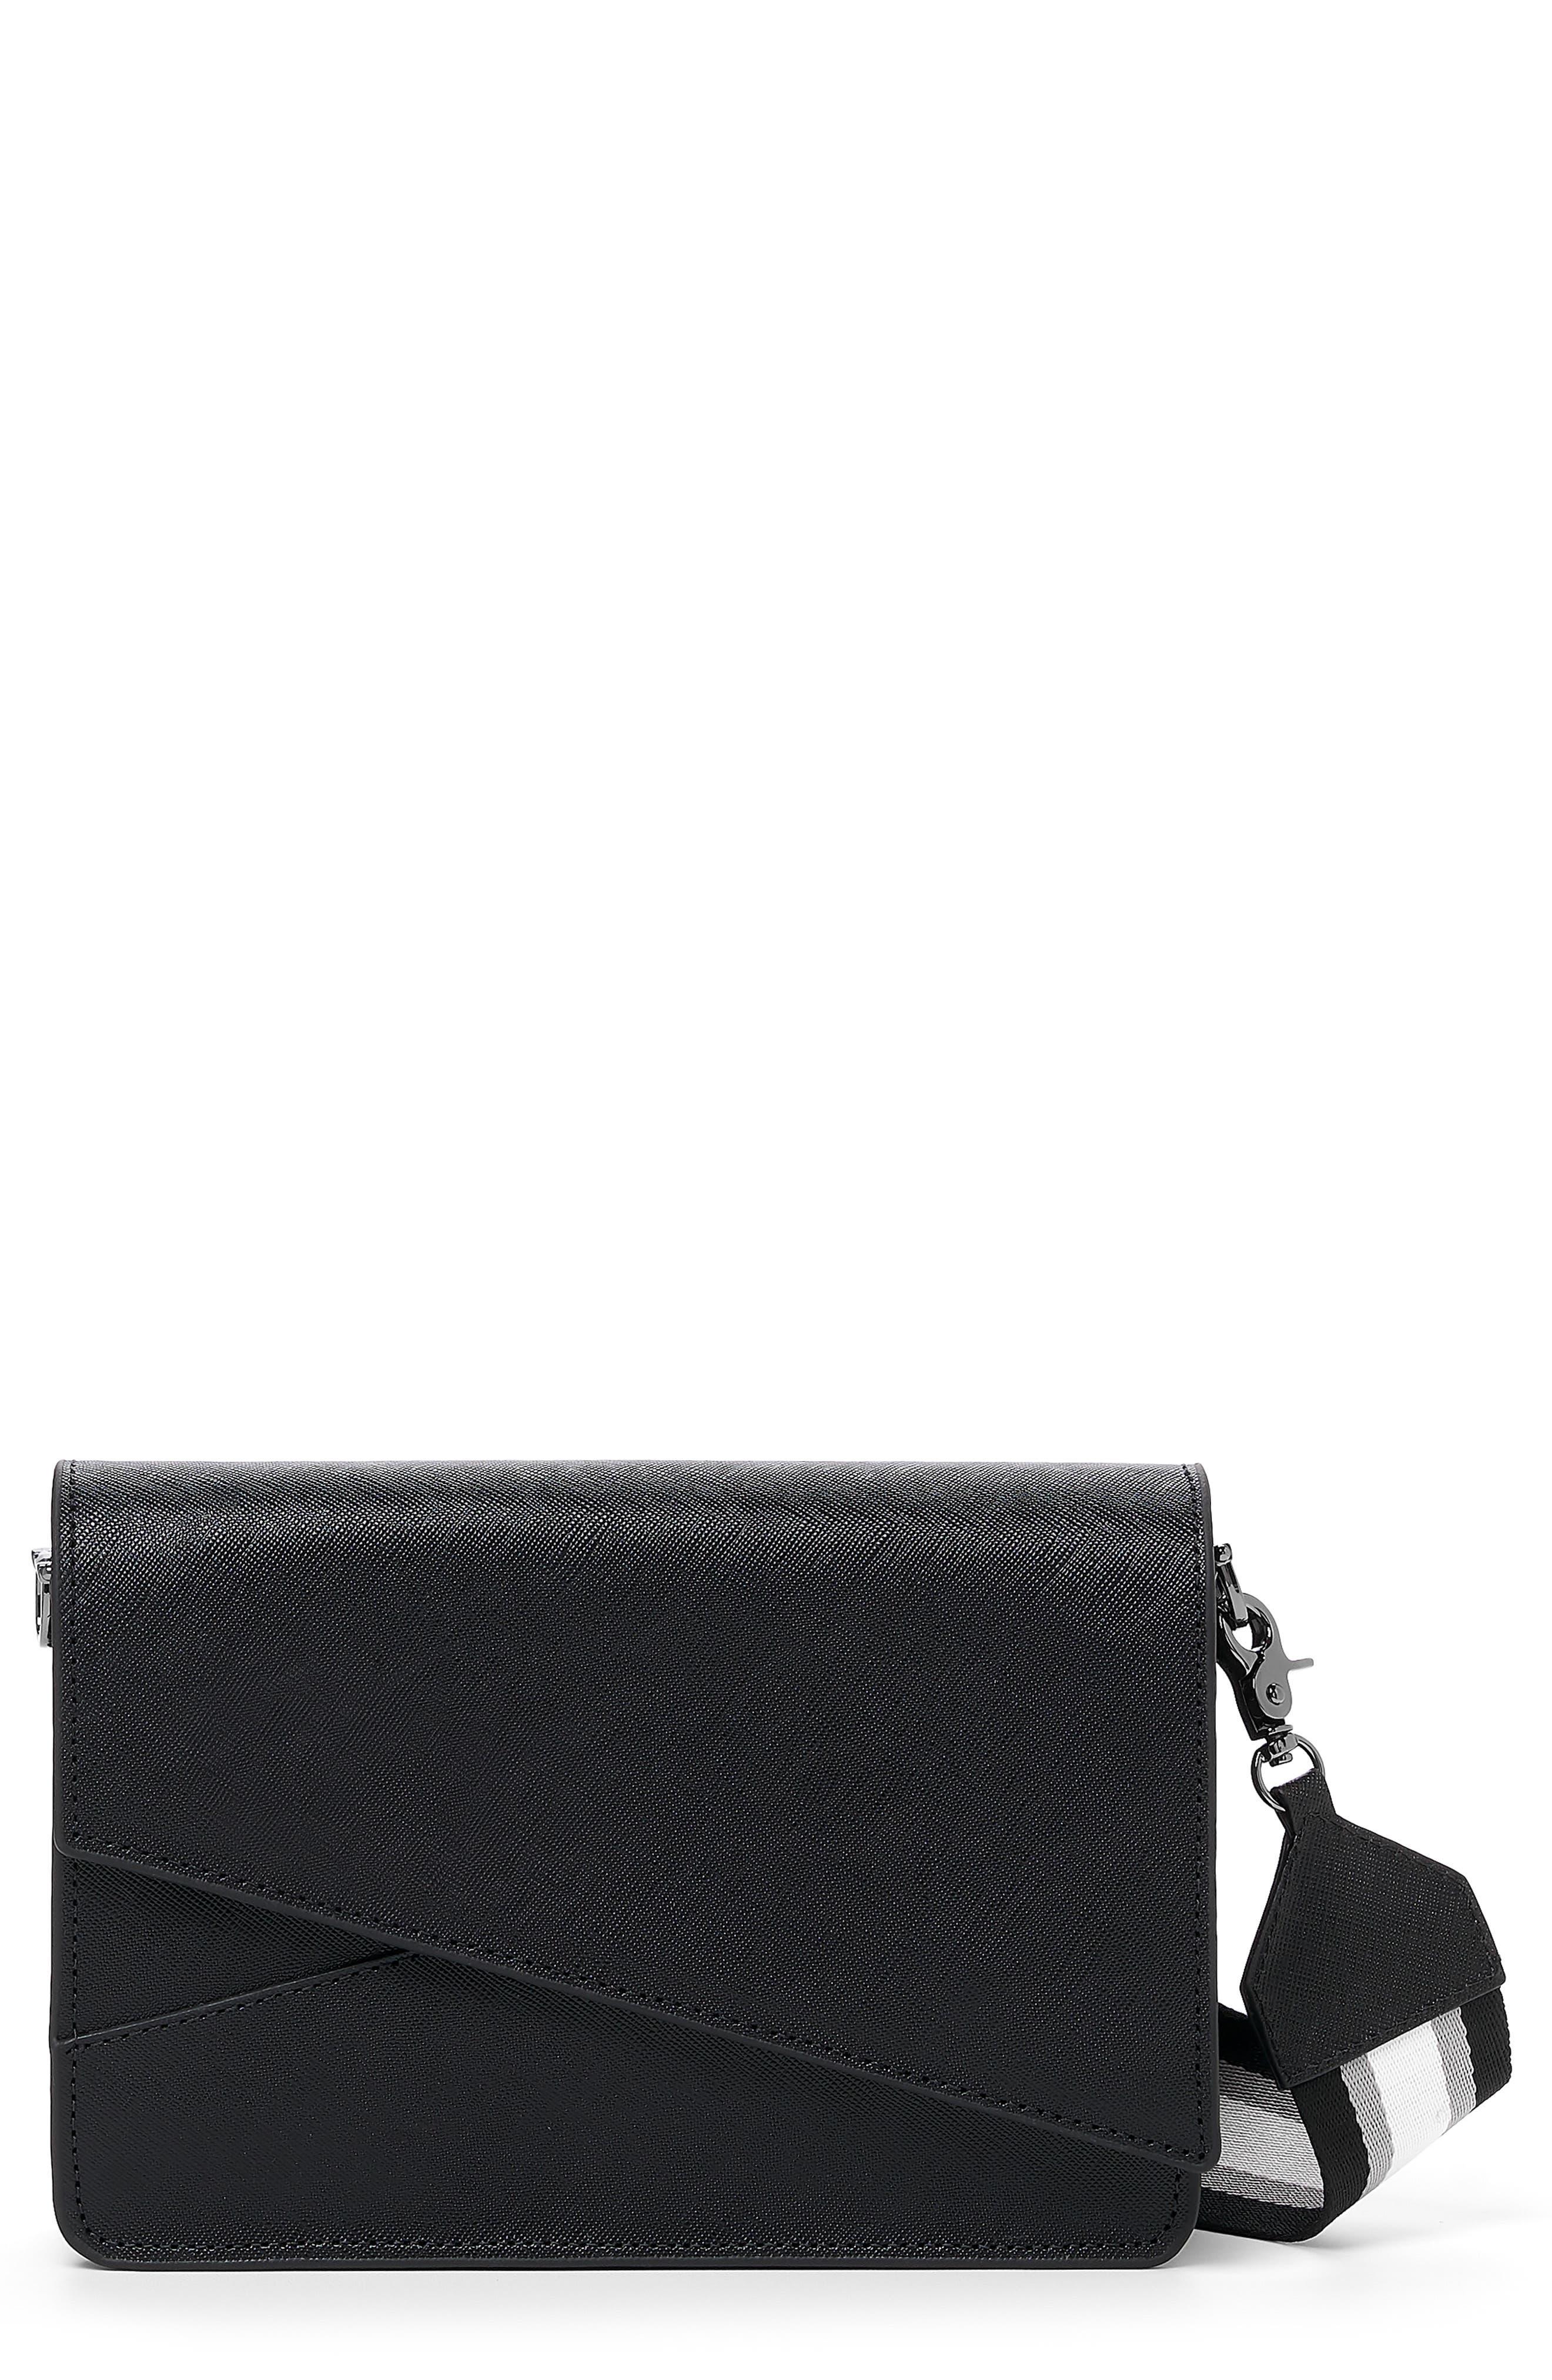 Crosstown Leather Crossbody Bag